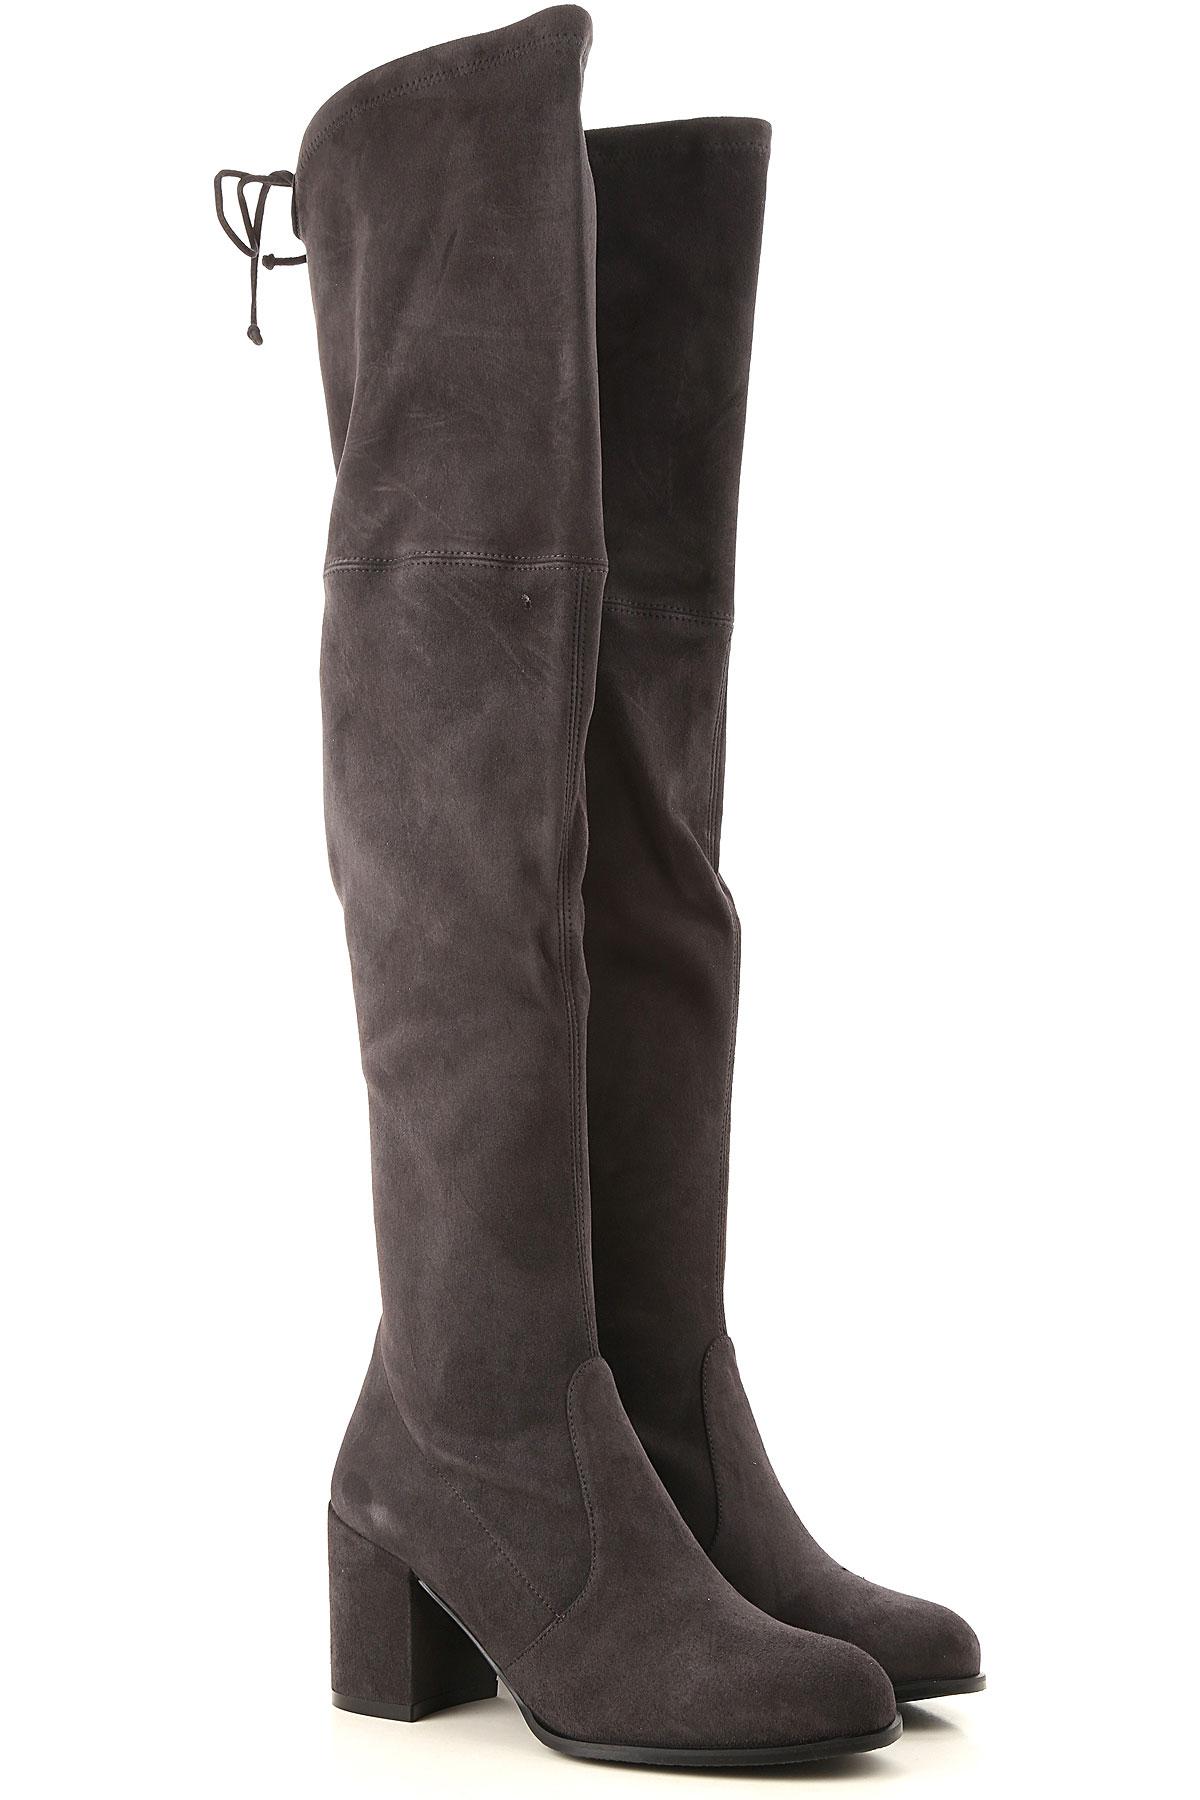 Stuart Weitzman Boots for Women, Booties On Sale, Asphalt Grey, Suede leather, 2019, US 6 (EU 36.5) US 6.5 (EU 37) US 7.5 (EU 38) US 8 (EU 38.5) US